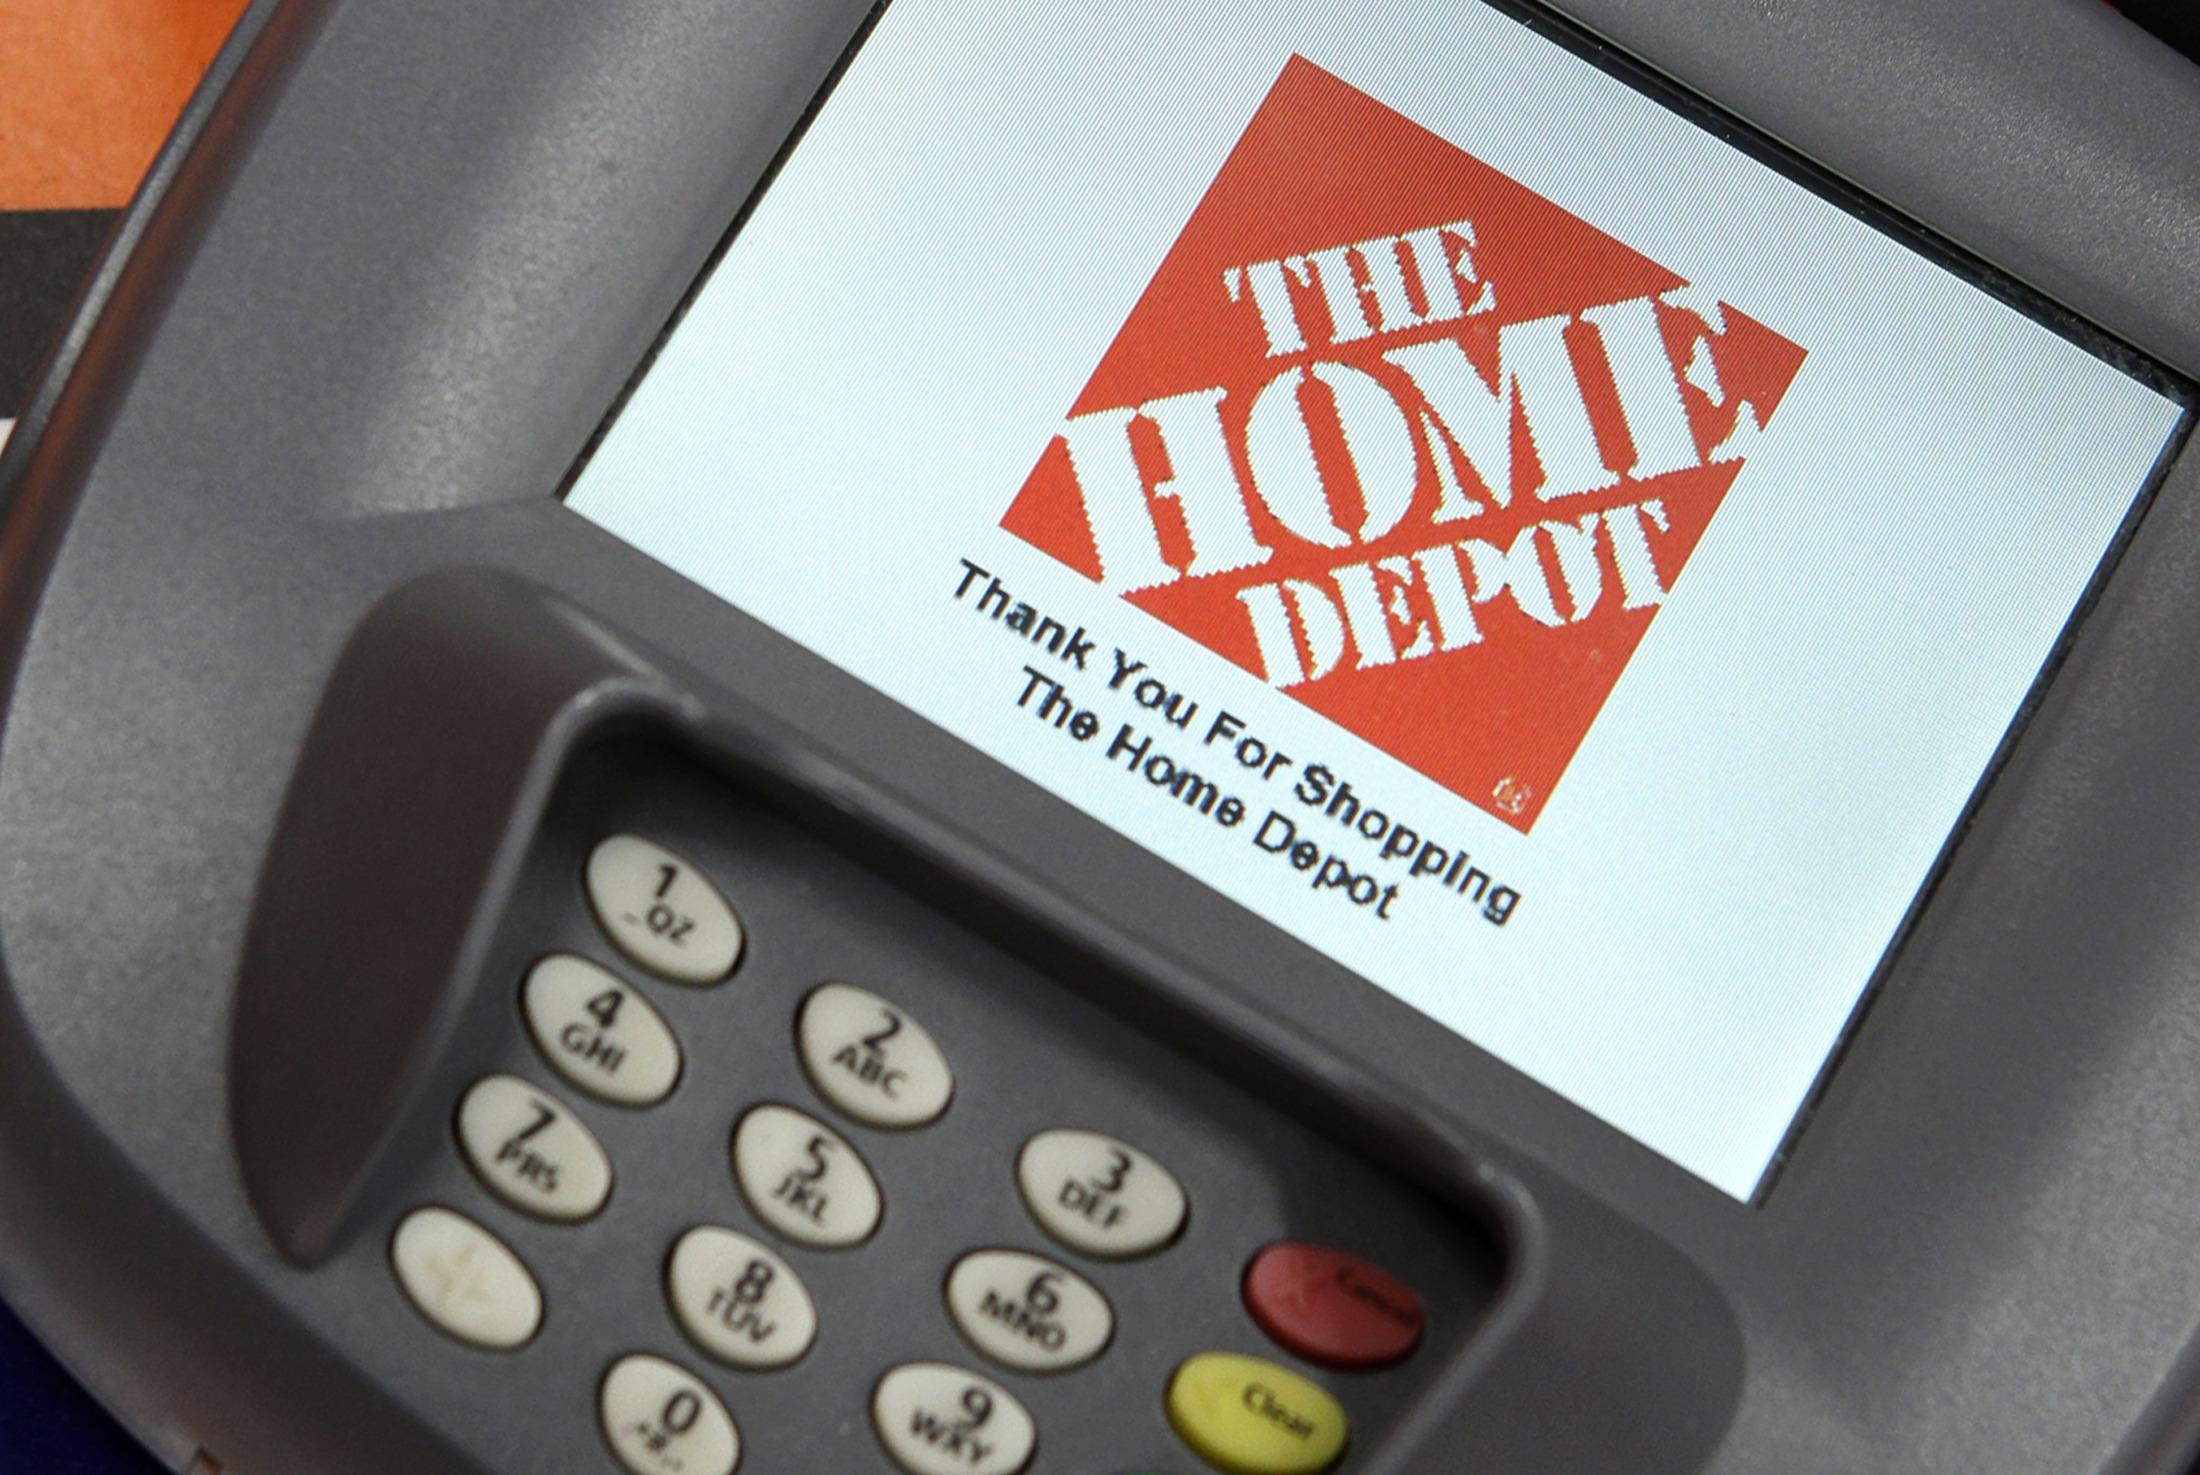 Home depot canada customer complaints